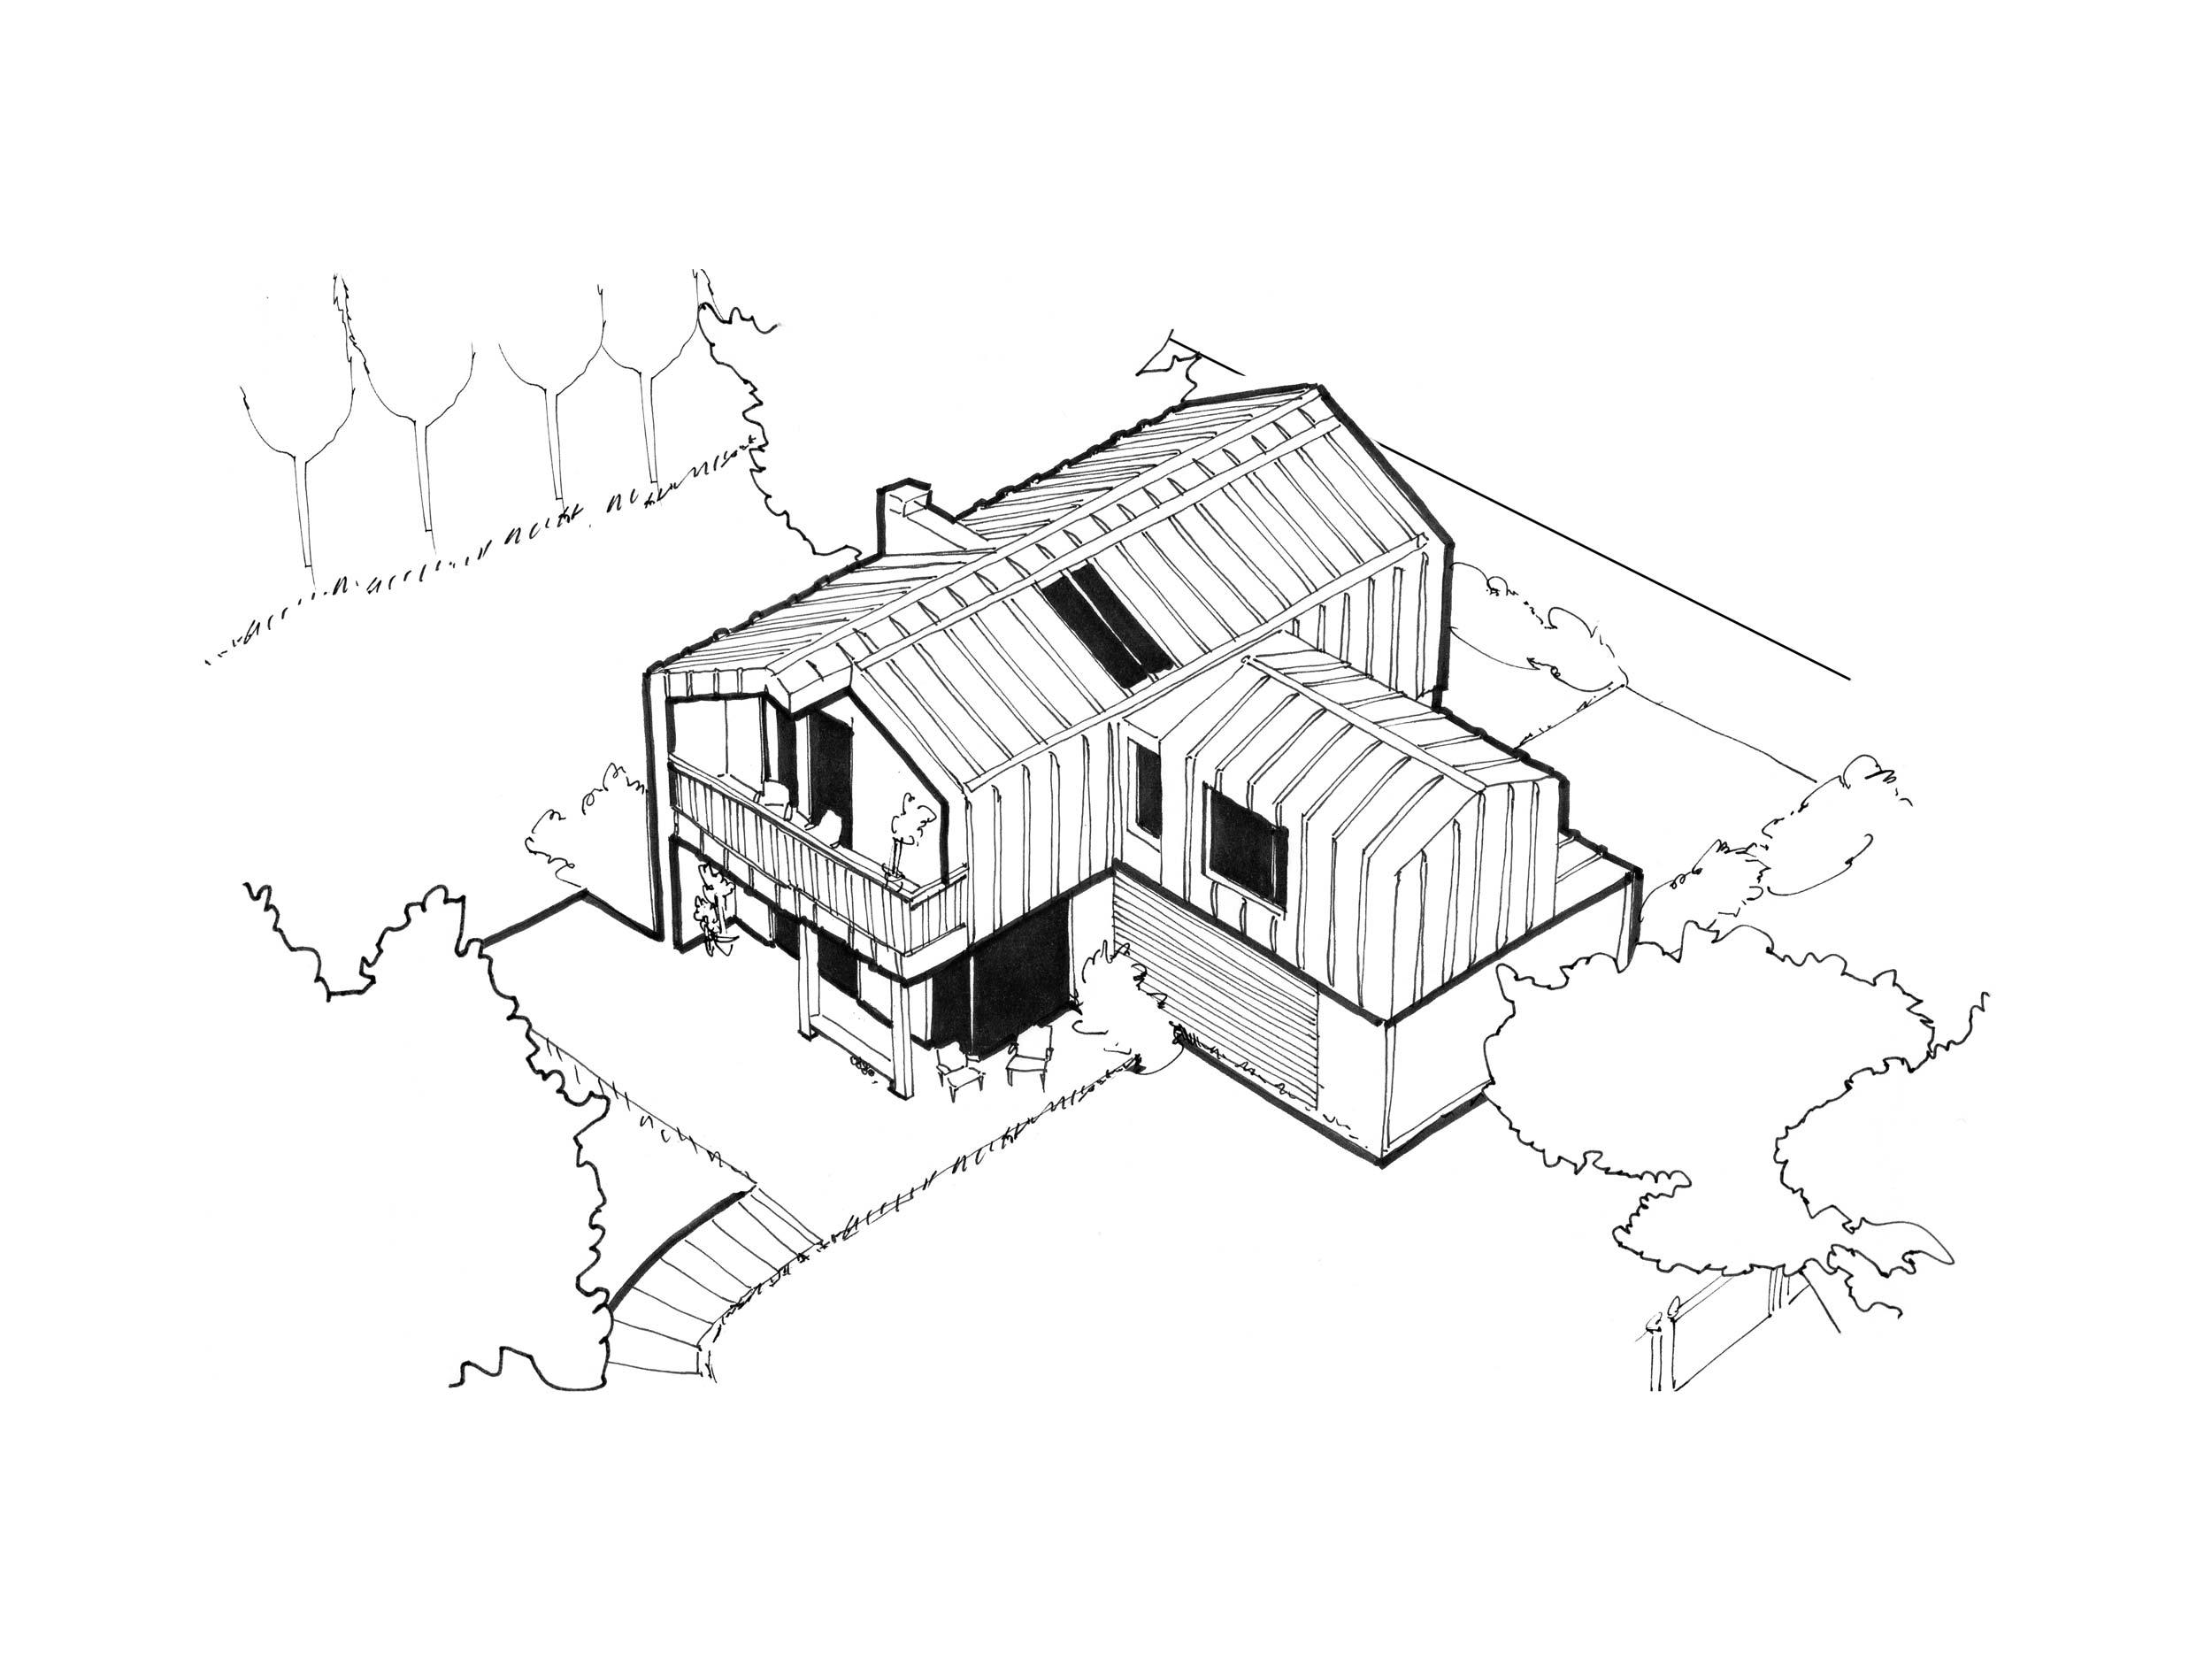 Alex-Kaiser-Different-illustration-CGI-london-visualisation-architecture-03.jpg